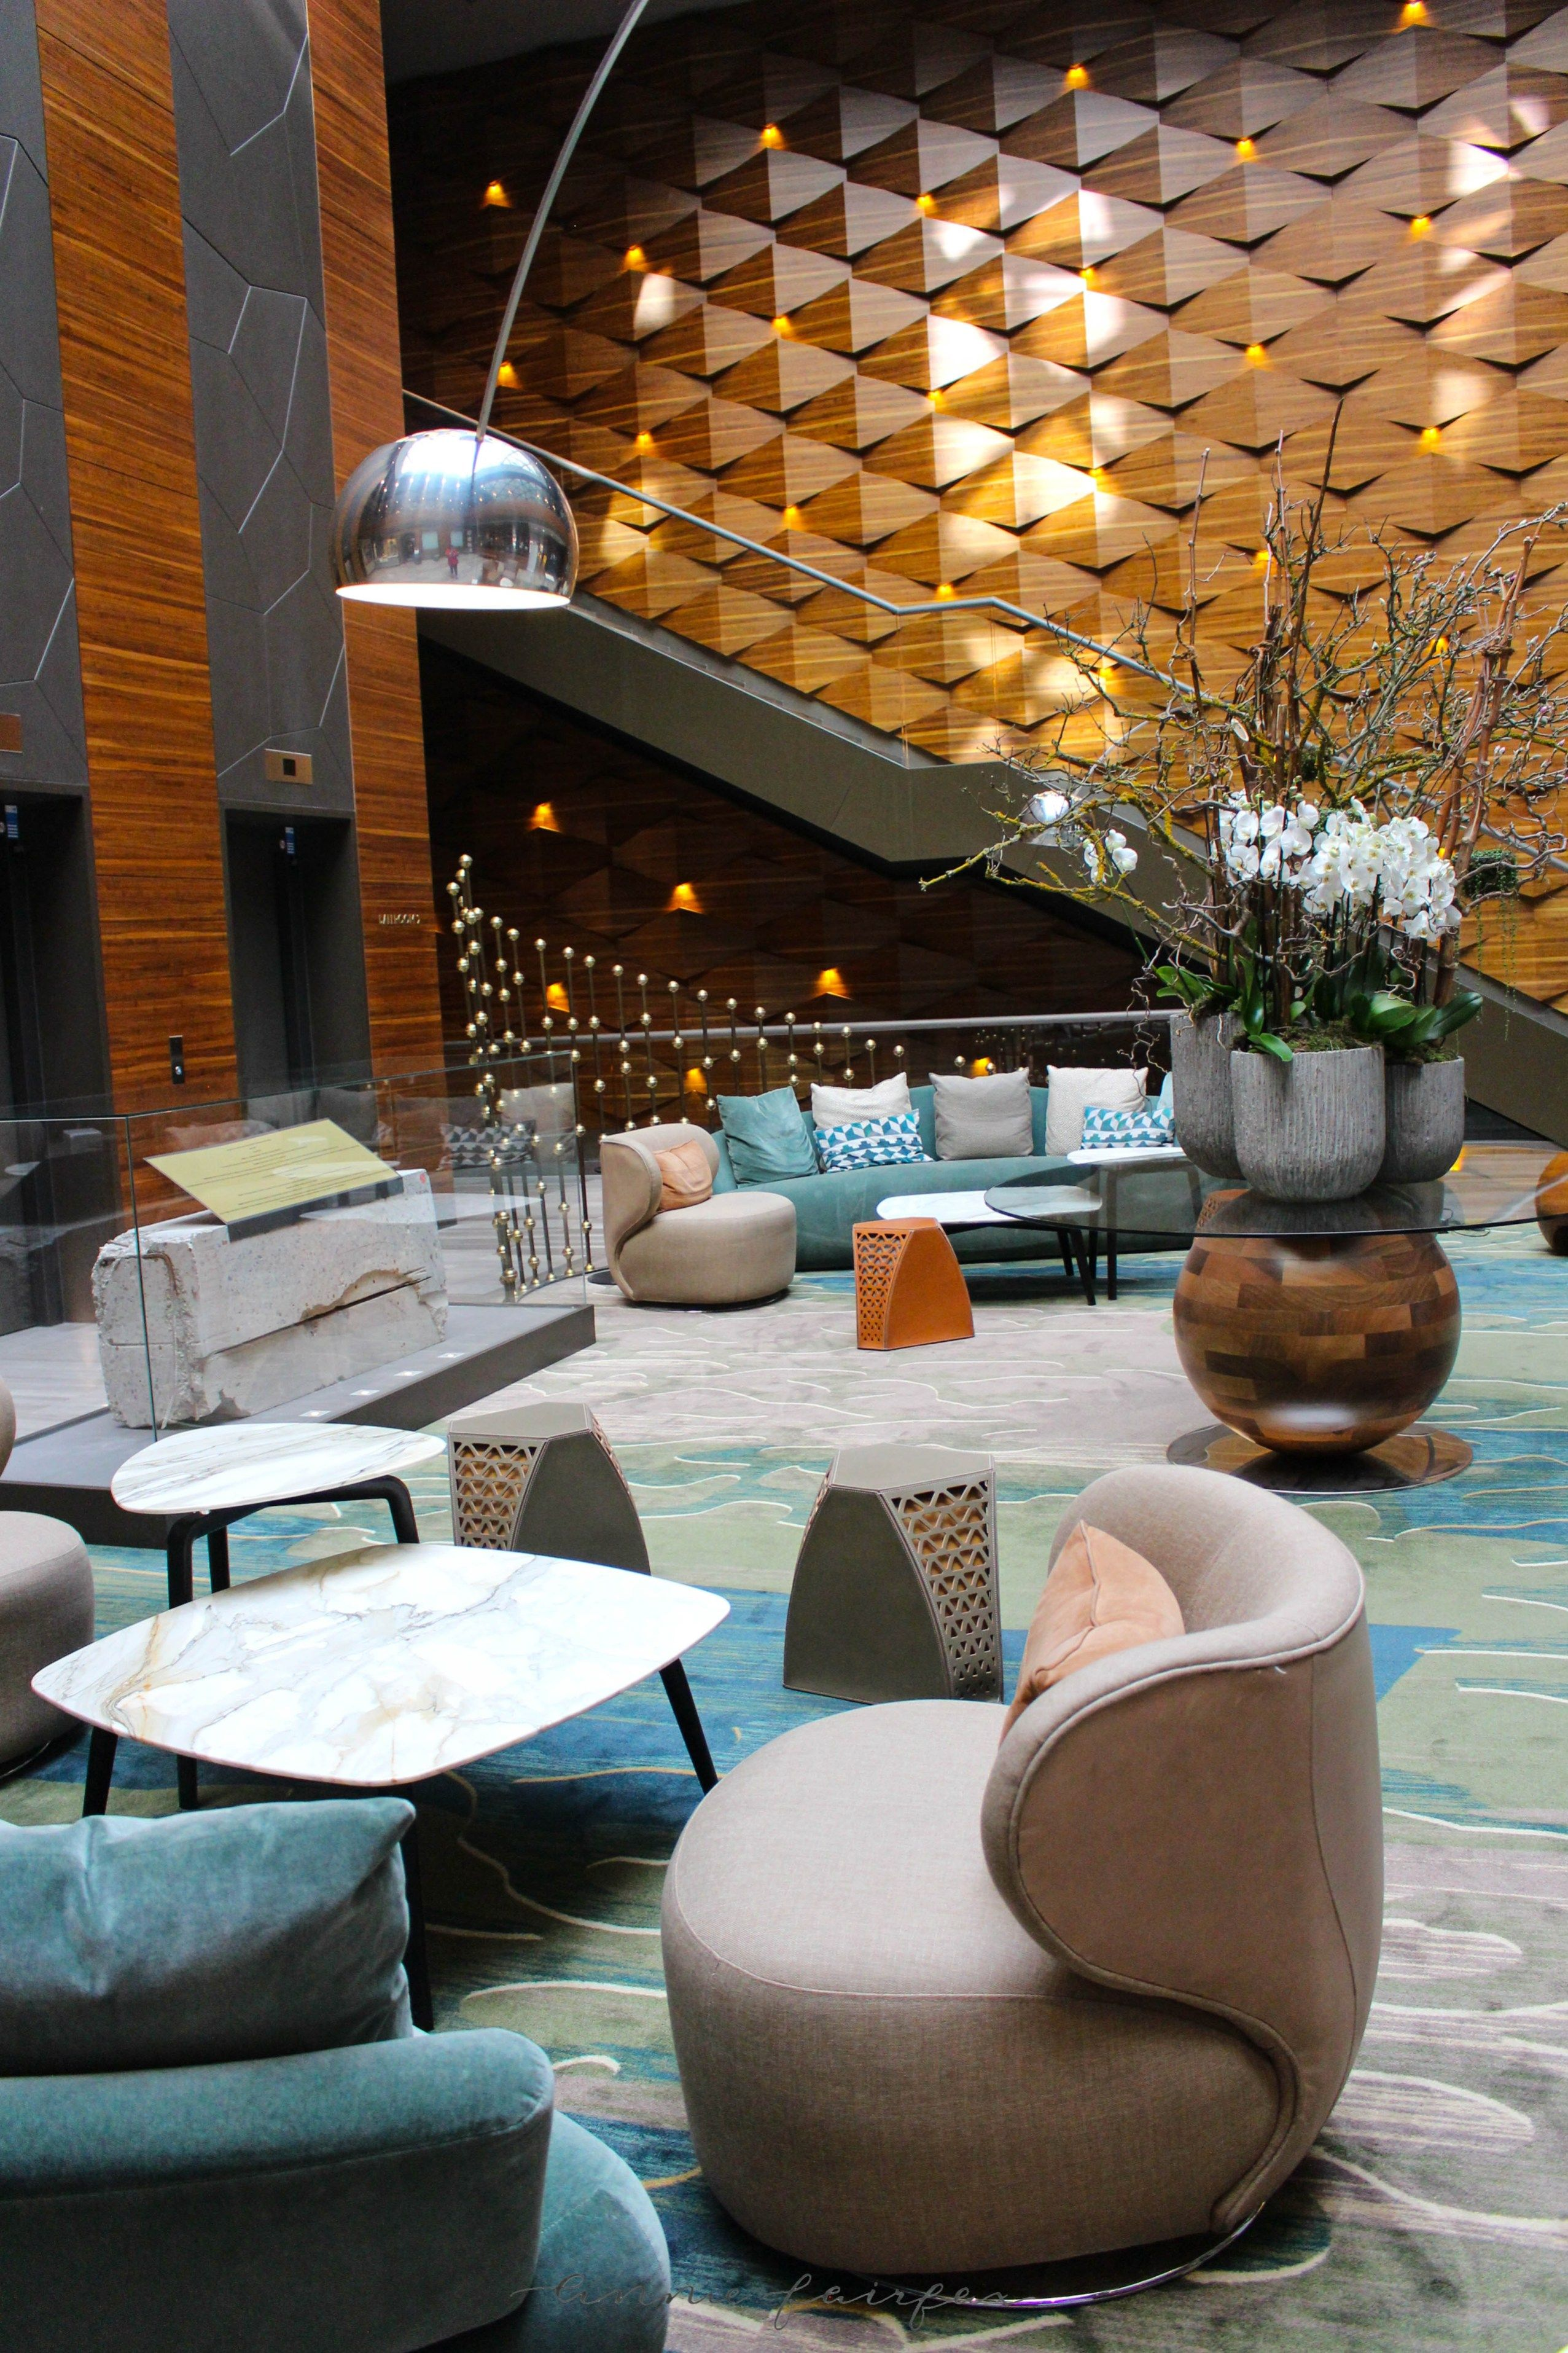 Luxury Hotels of the World Titanic Chaussee Berlin   Luxury hotel ...